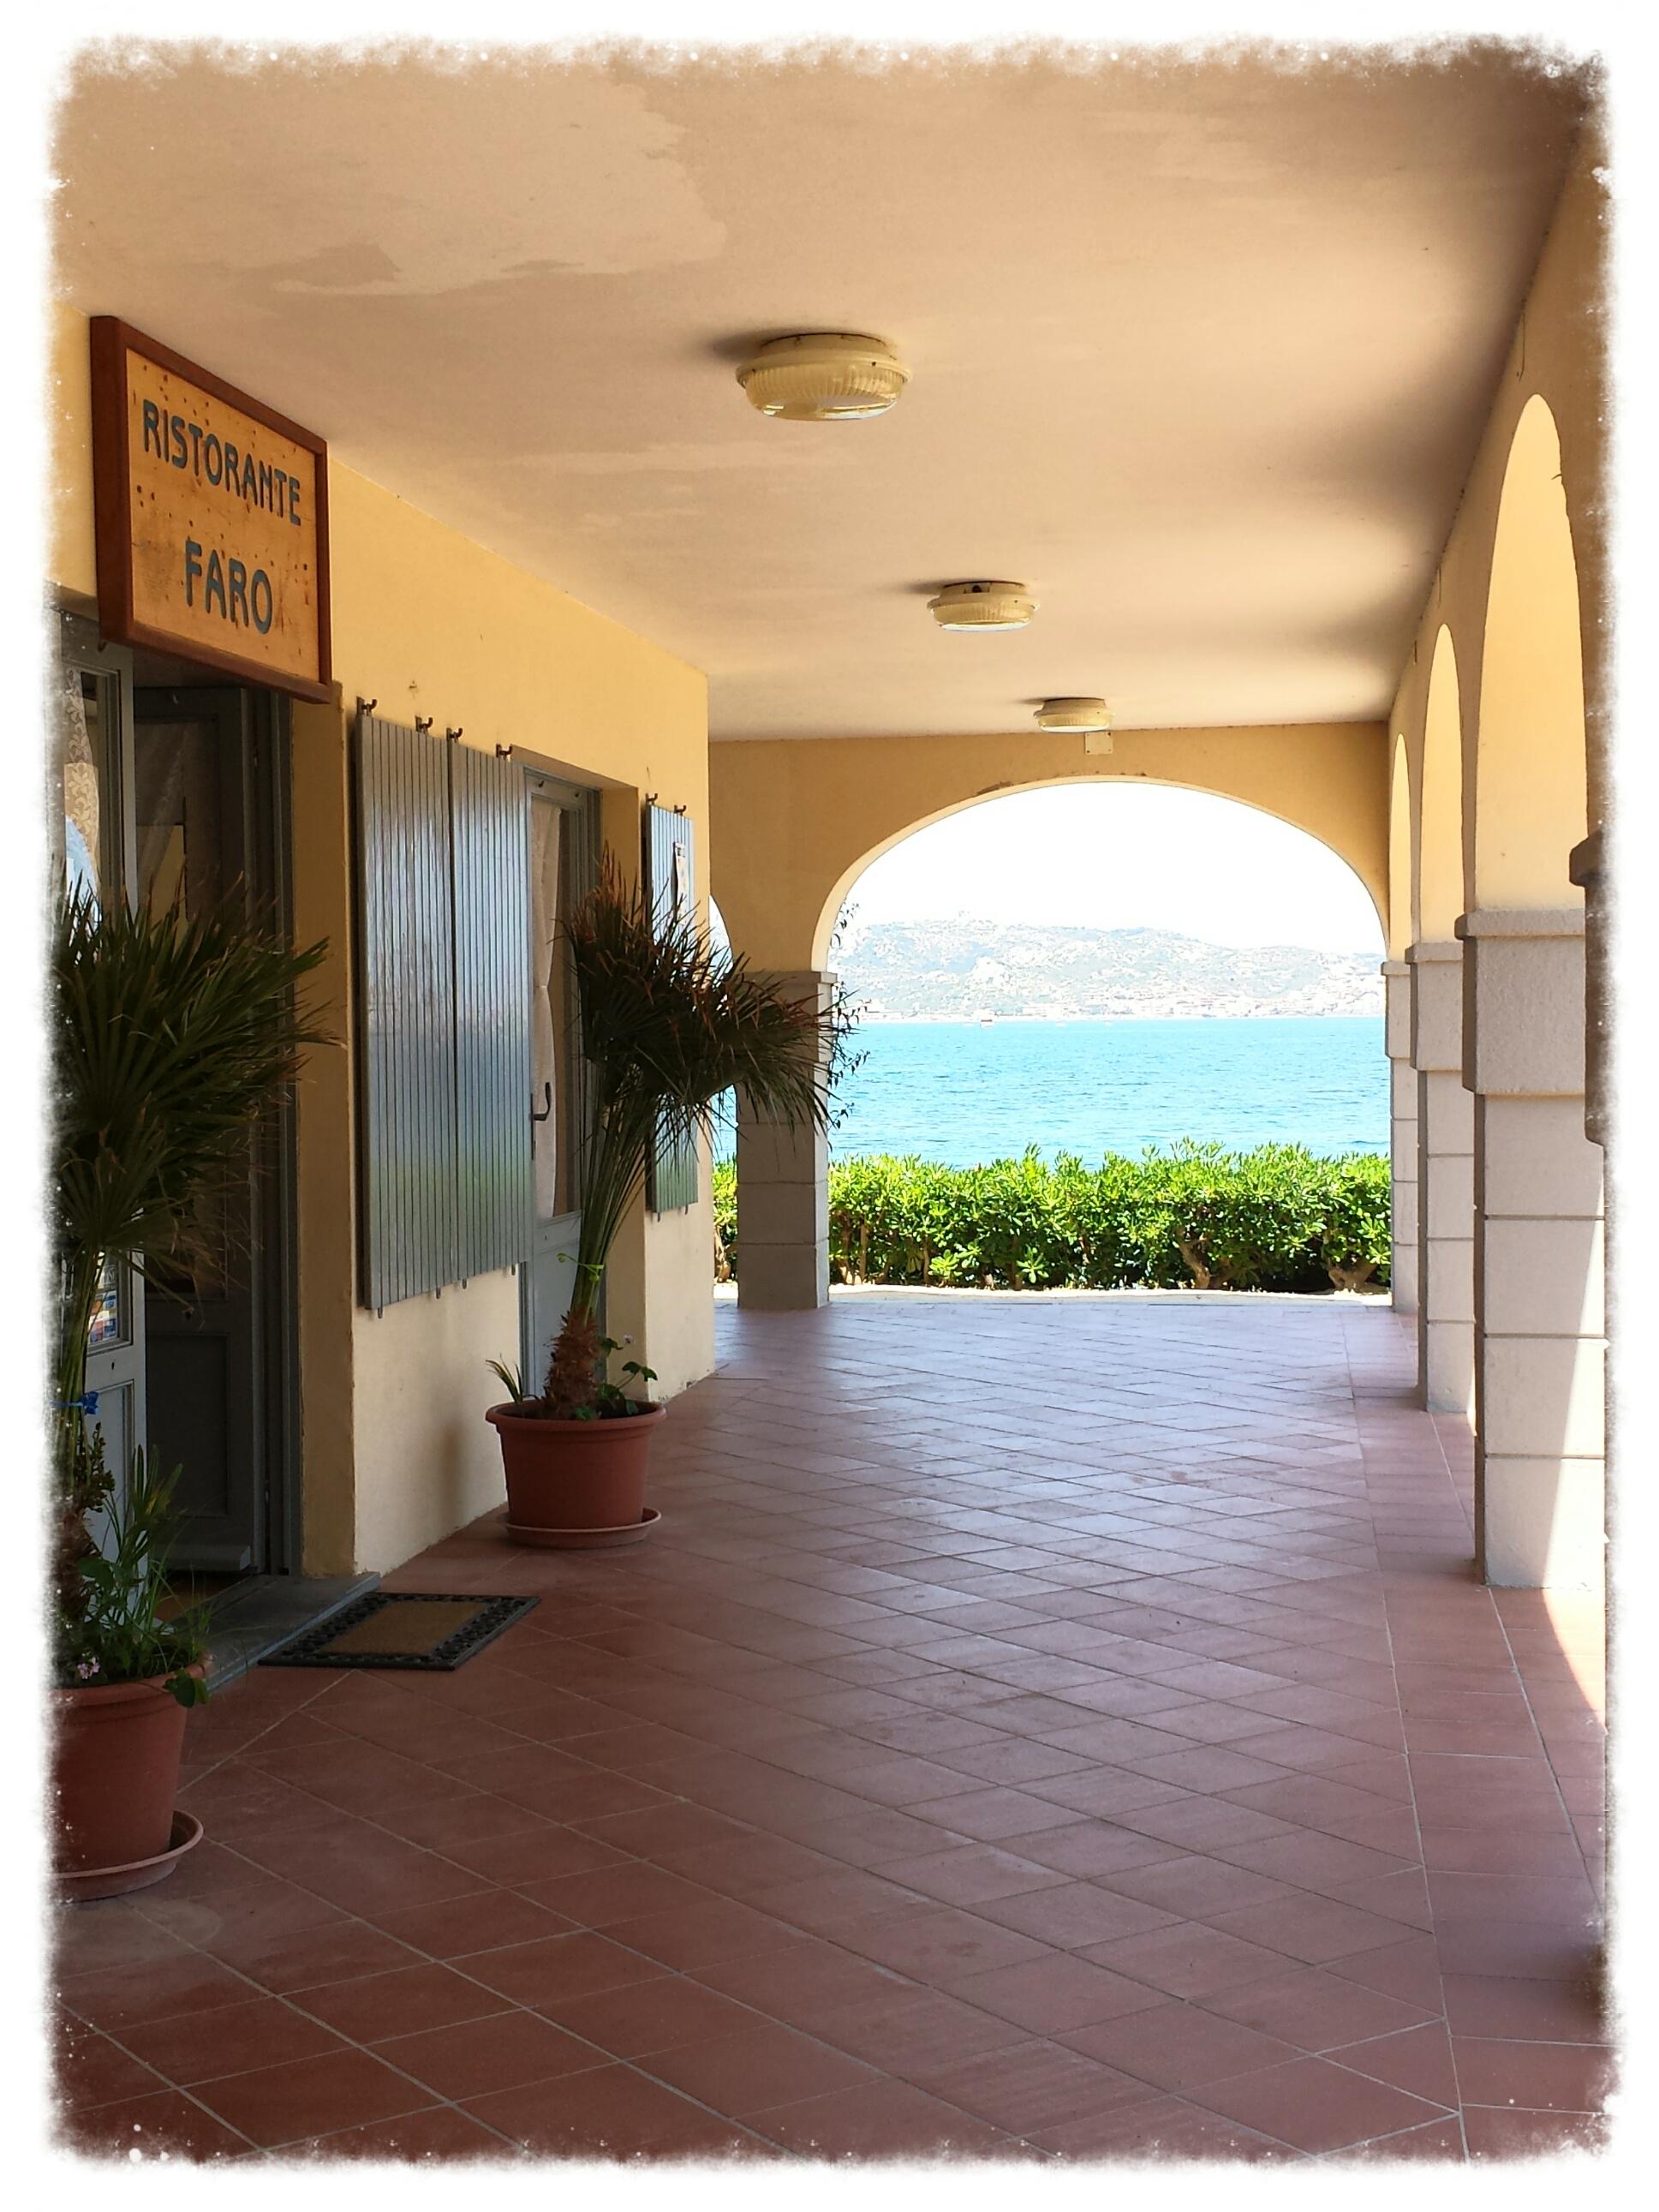 Ristorante Faro Palau